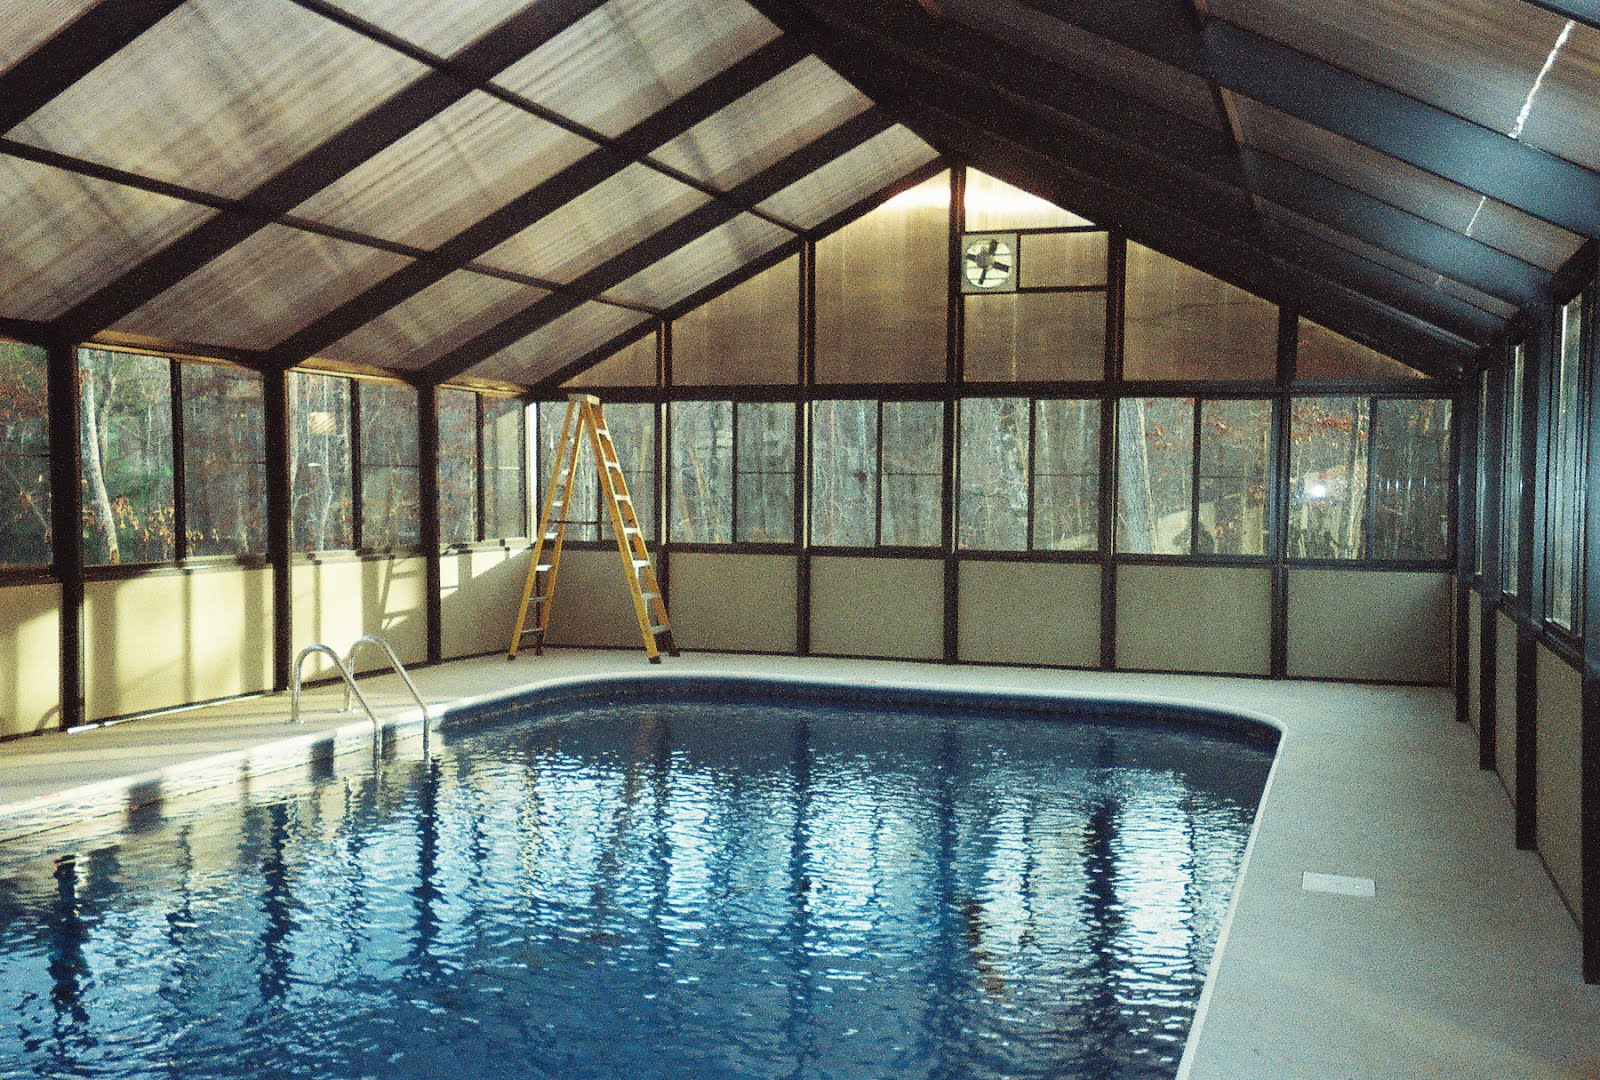 Pool enclosures usa estimating pool enclosure costs for Enclosed pools